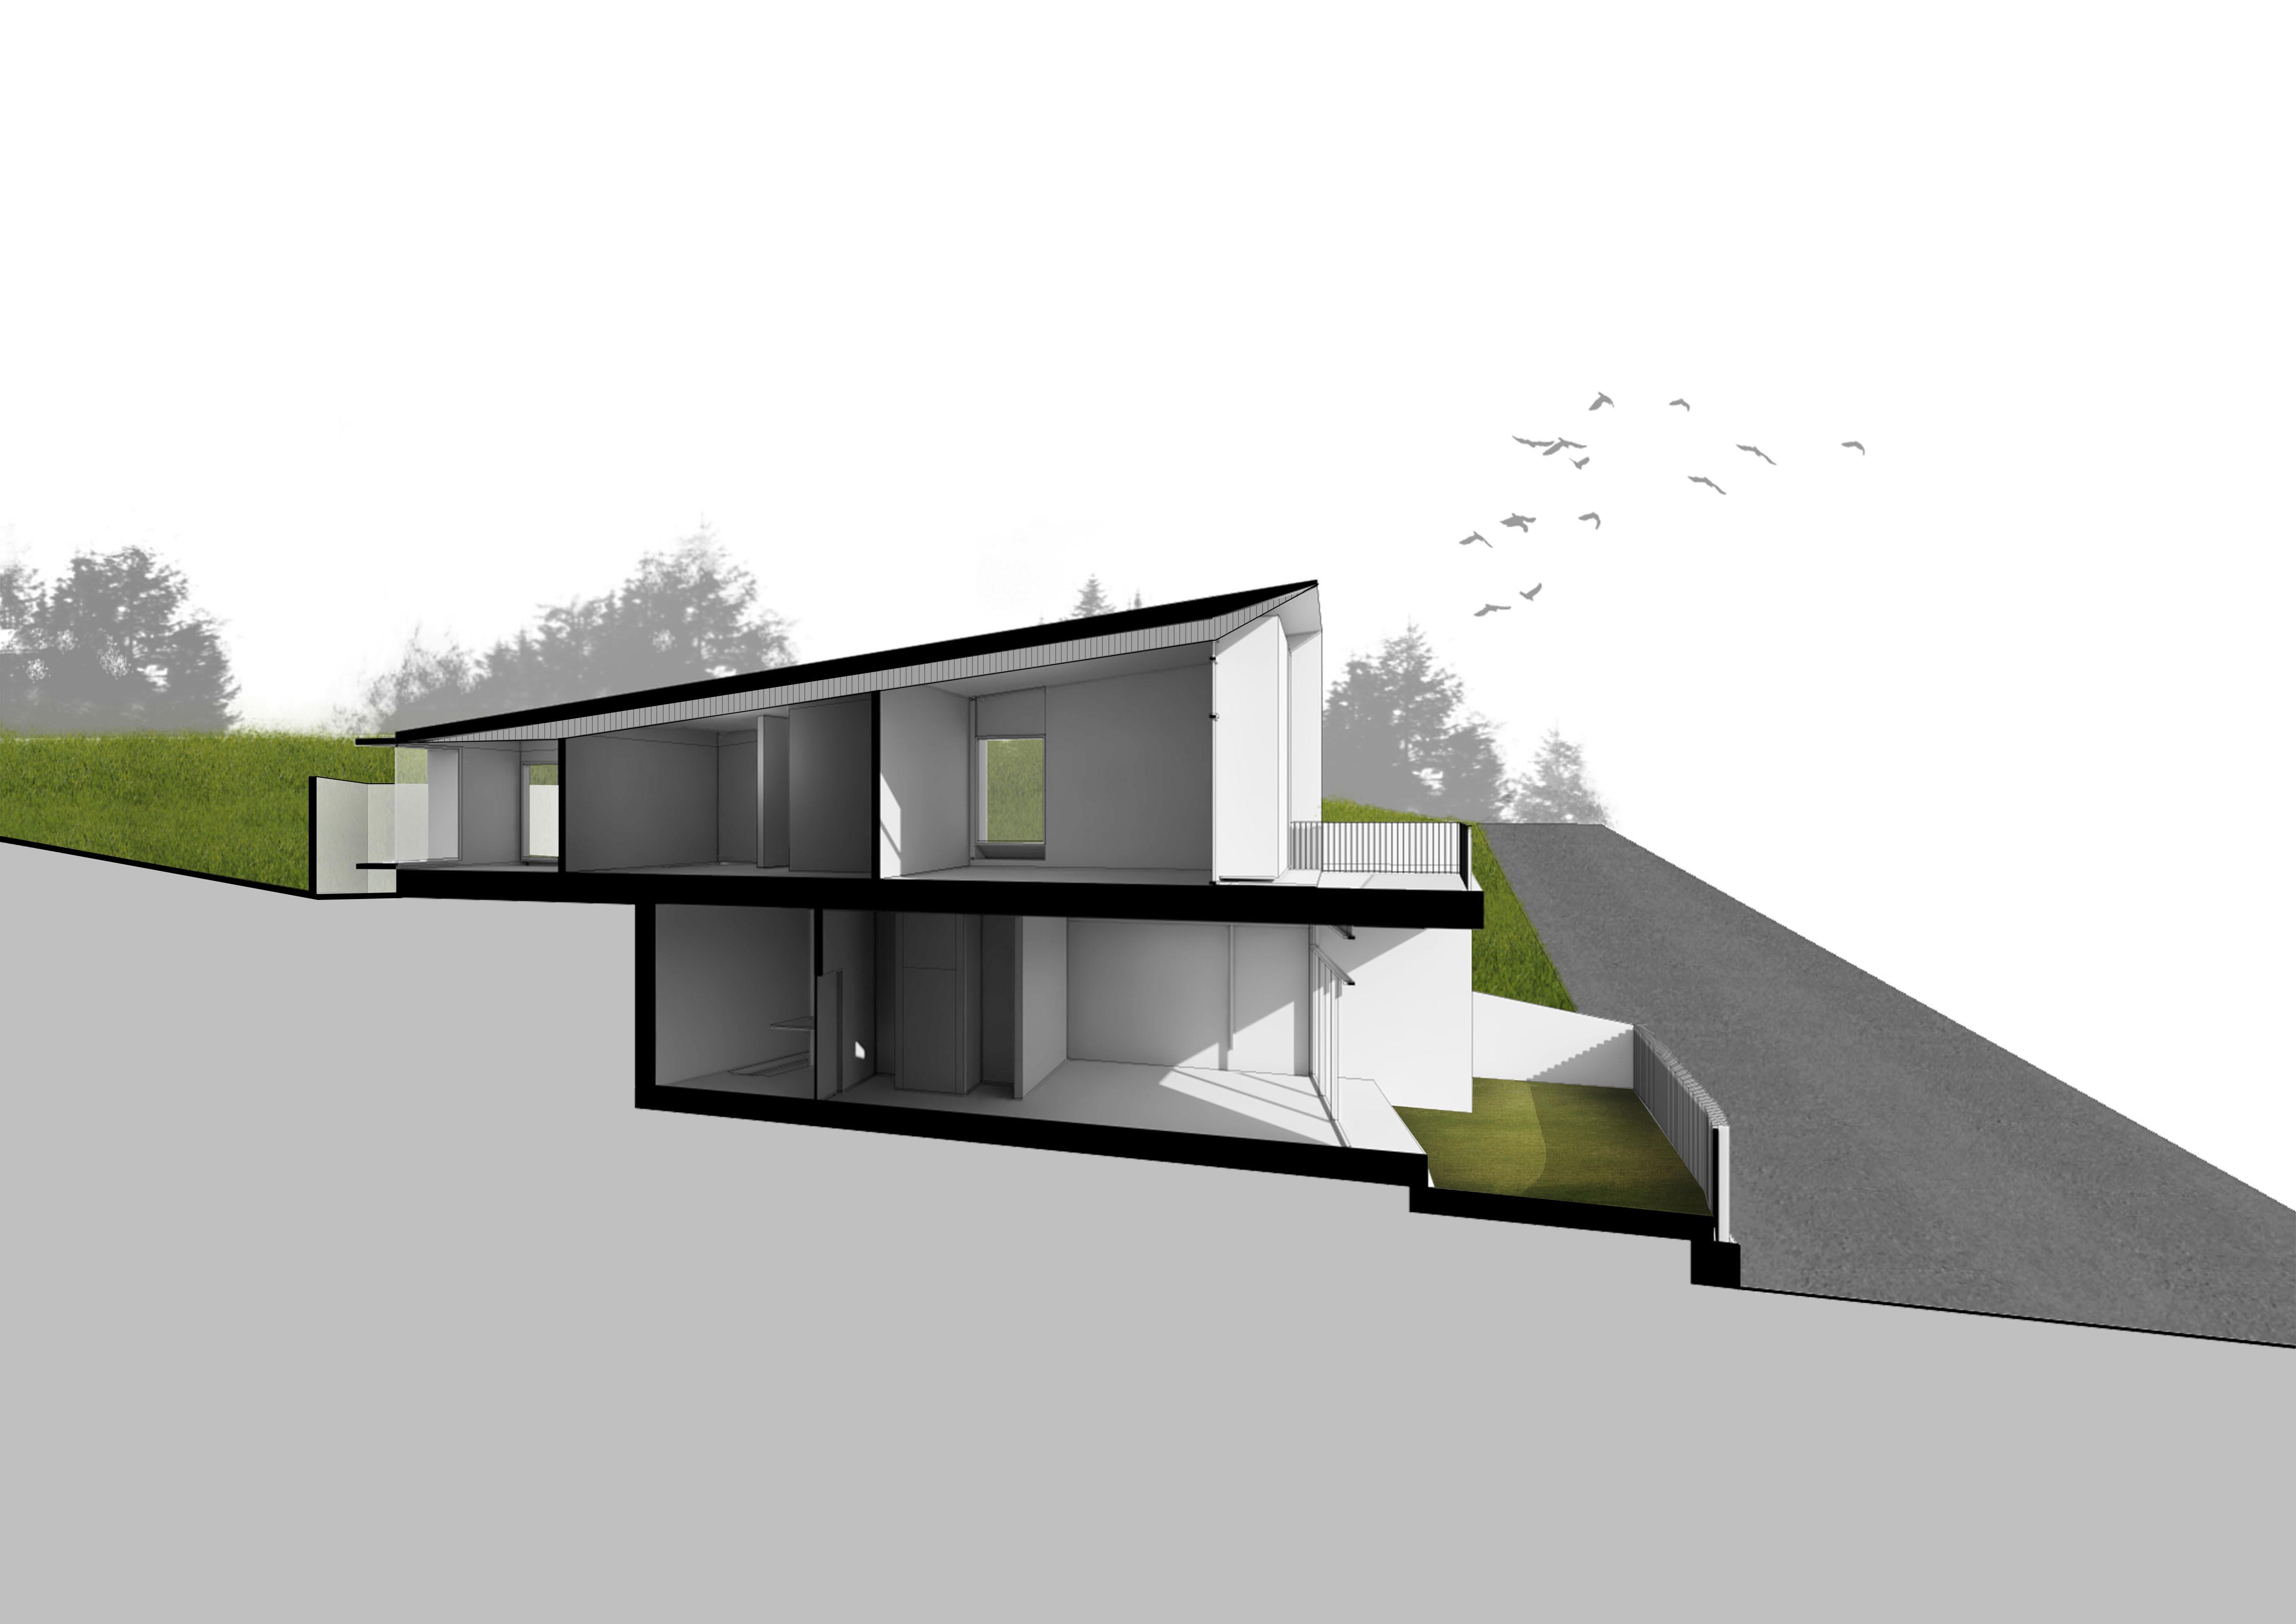 Sectional Perspective C-C Zubu Design Associates}